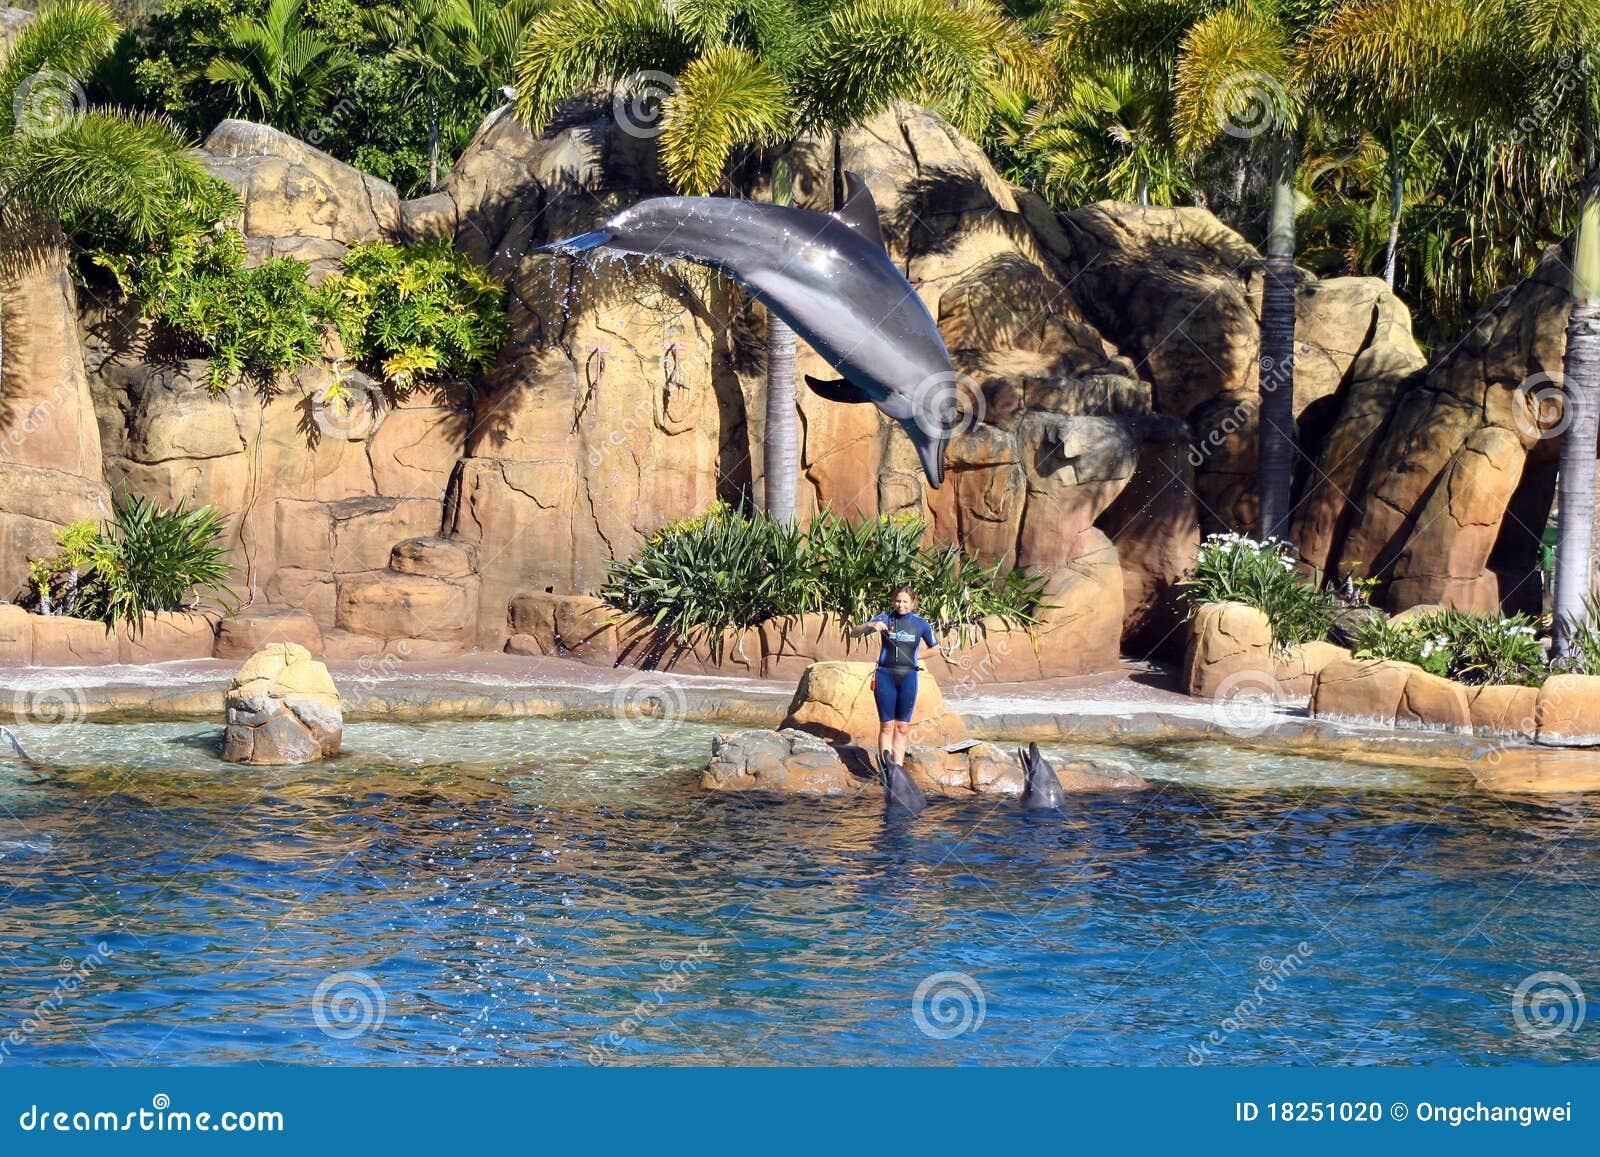 Sea world performer??